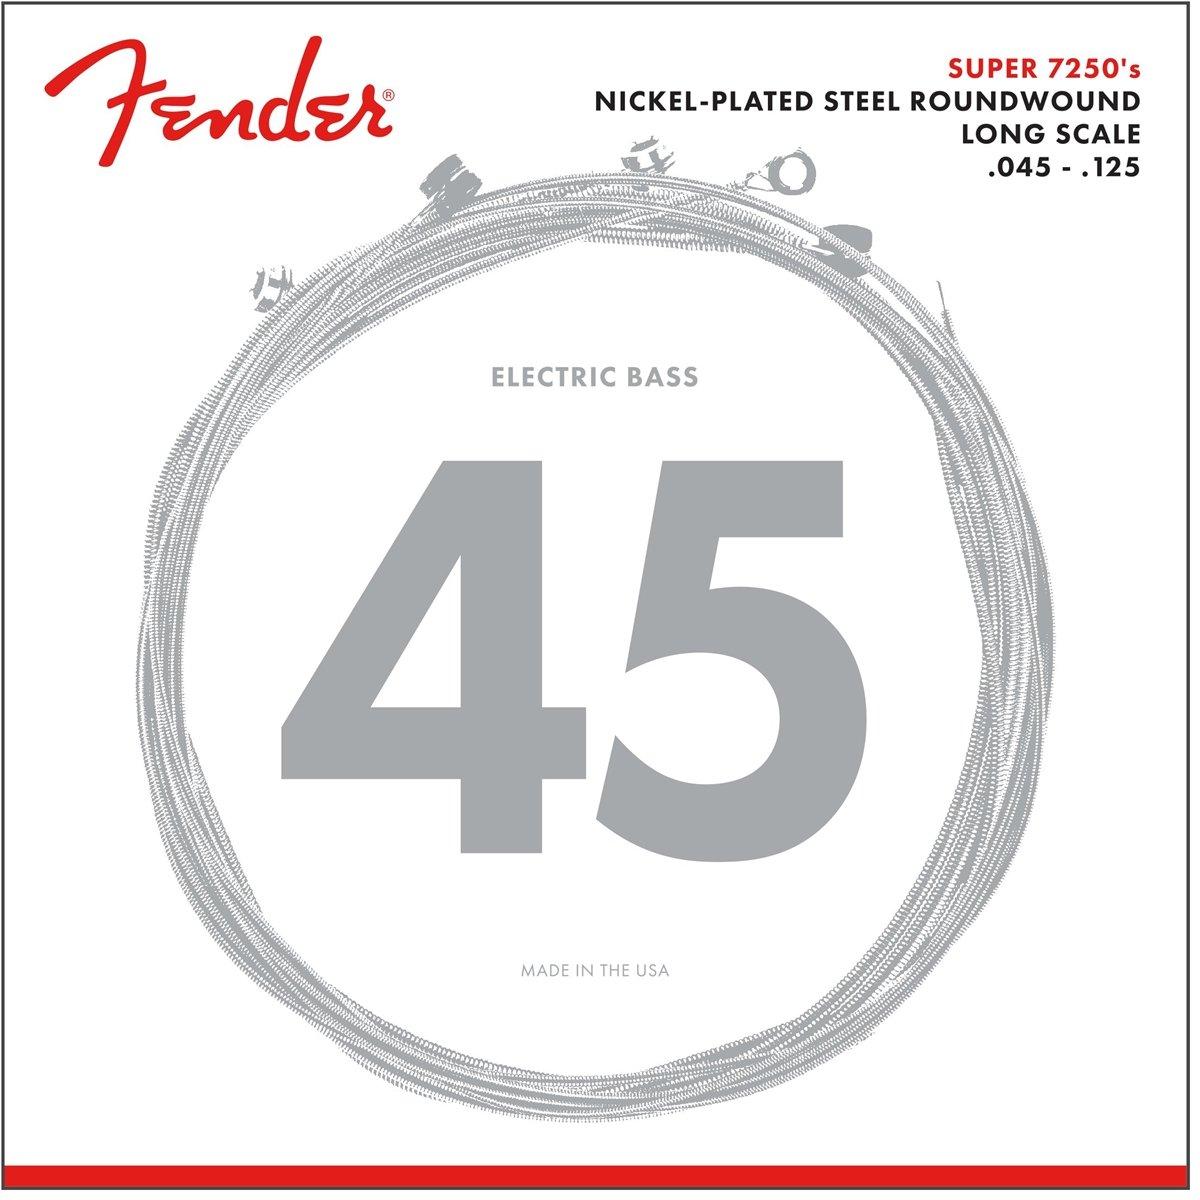 Amazon fender 7250 nickel plated steel roundwound bass strings amazon fender 7250 nickel plated steel roundwound bass strings v string musical instruments buycottarizona Gallery